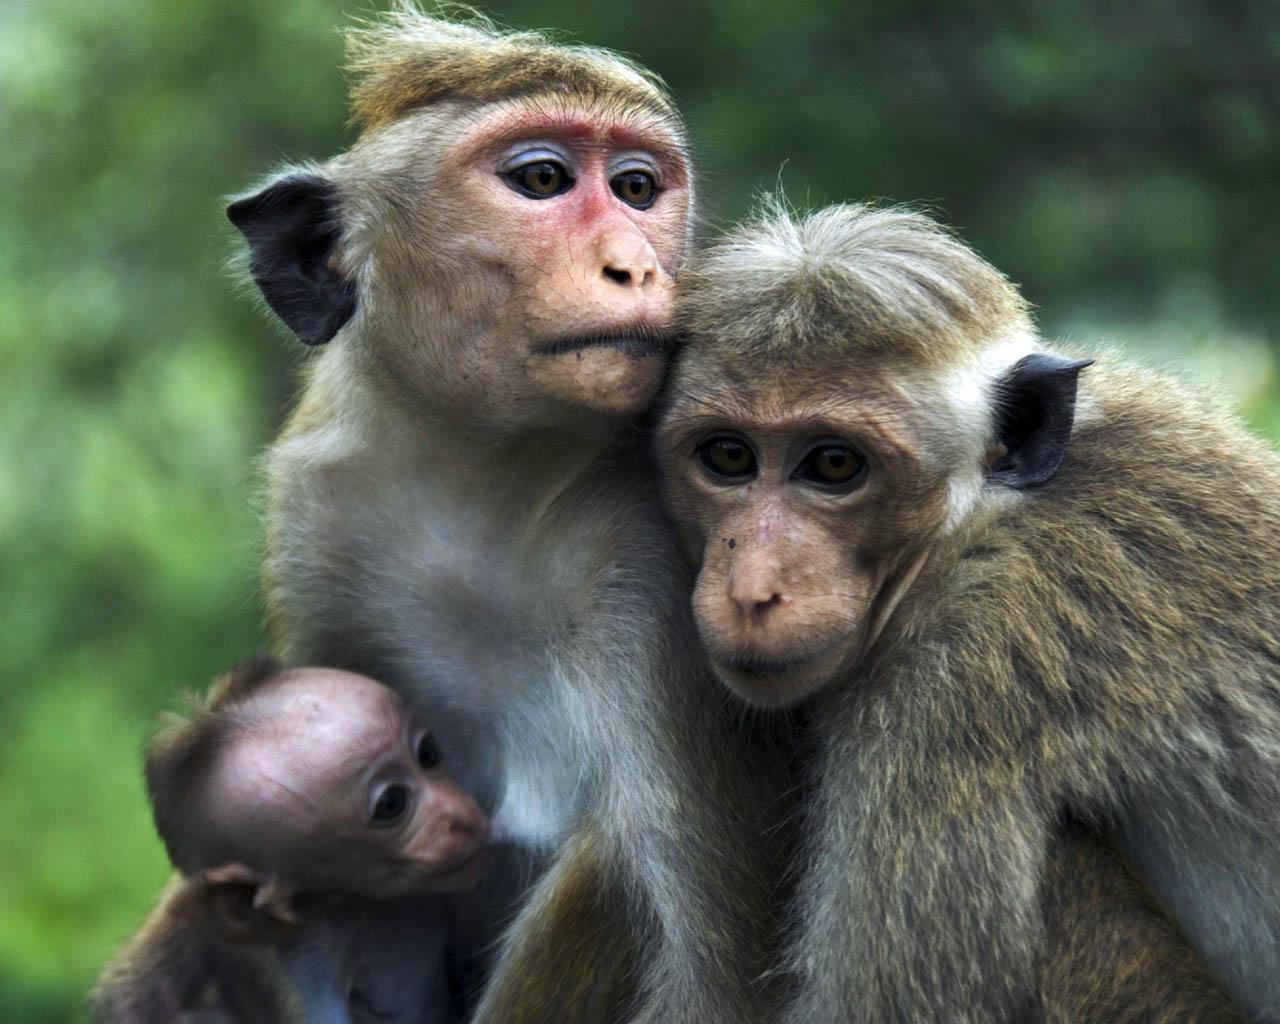 Monkey Wallpapers Top Free Monkey Backgrounds